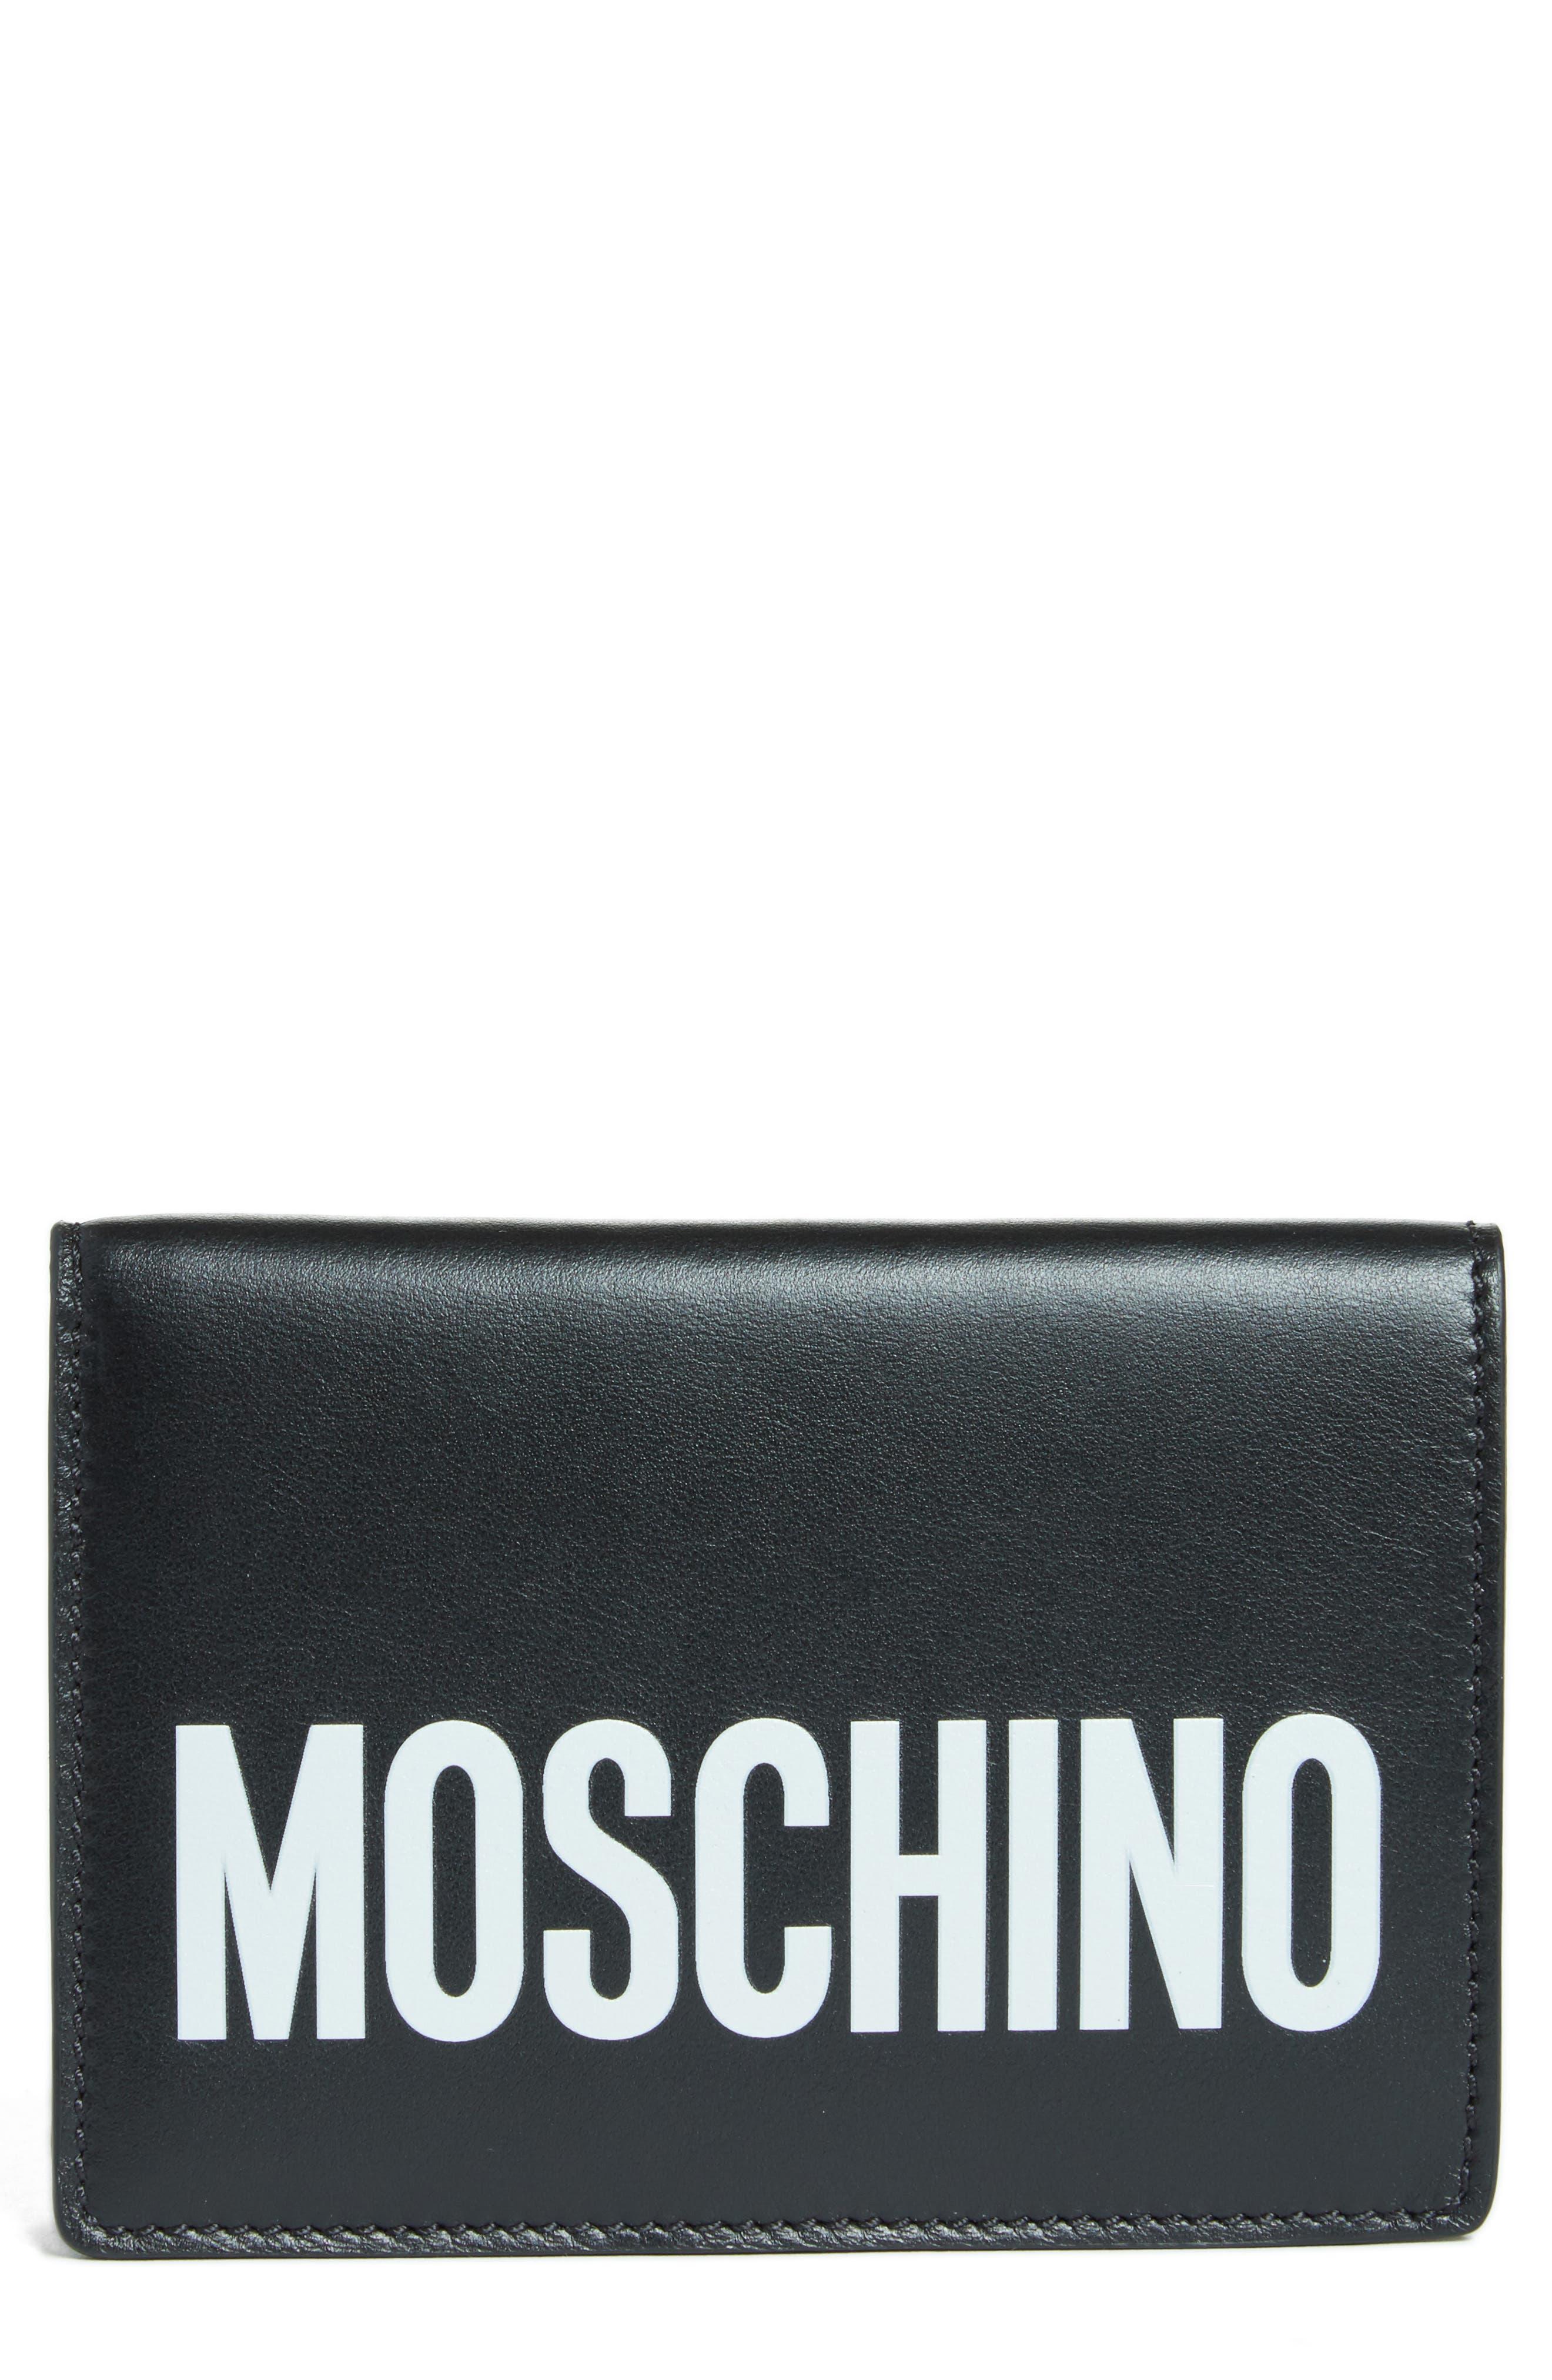 Logo Leather Passport Holder,                         Main,                         color, Black/White